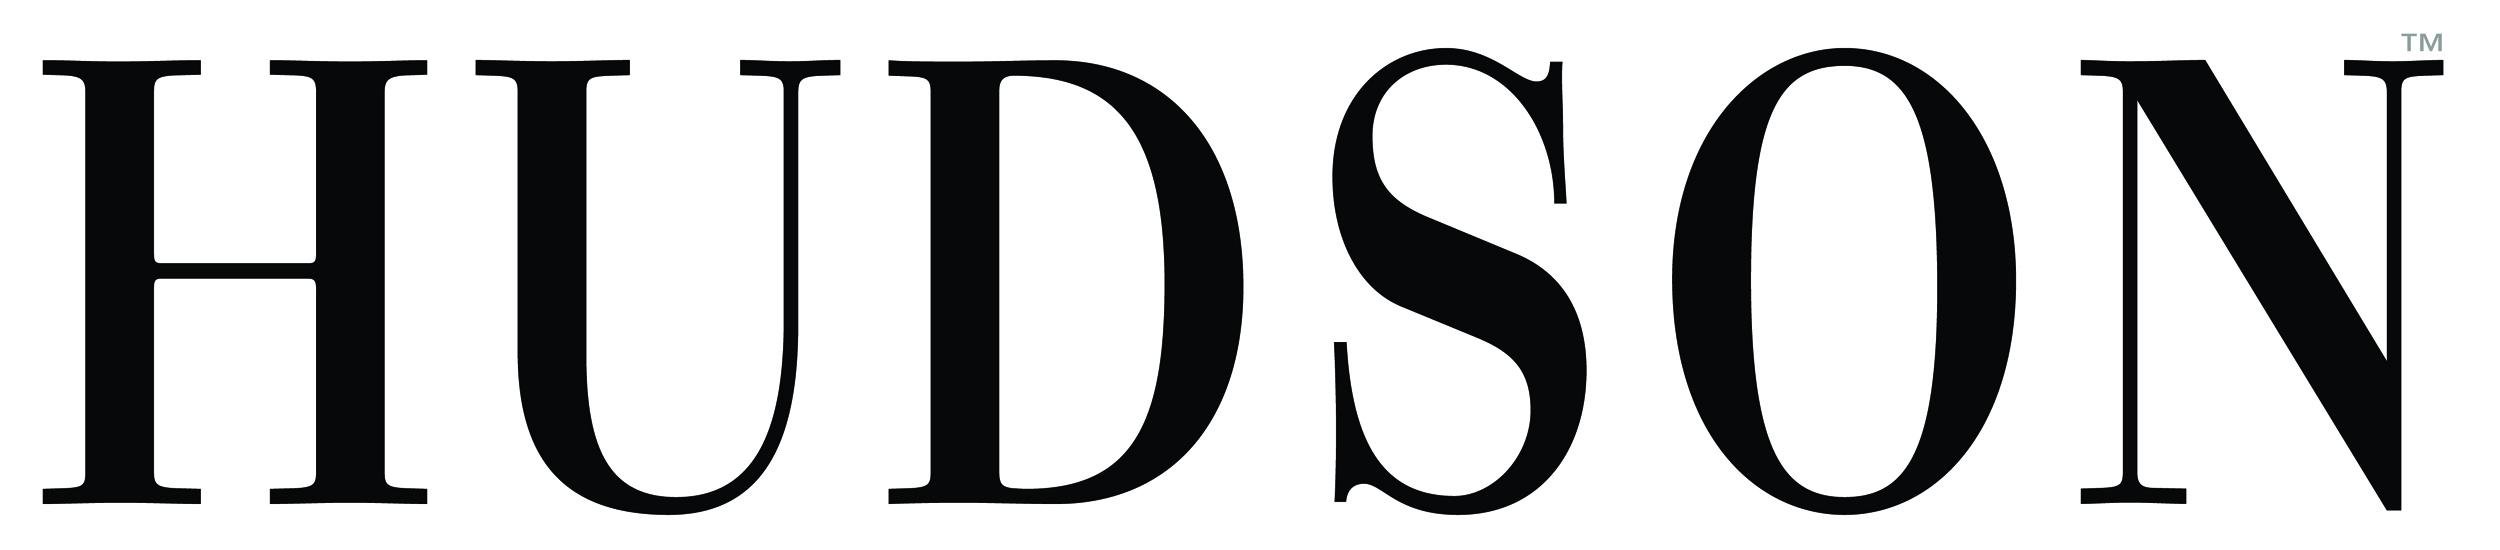 HudsonLogo_EditorialDesign